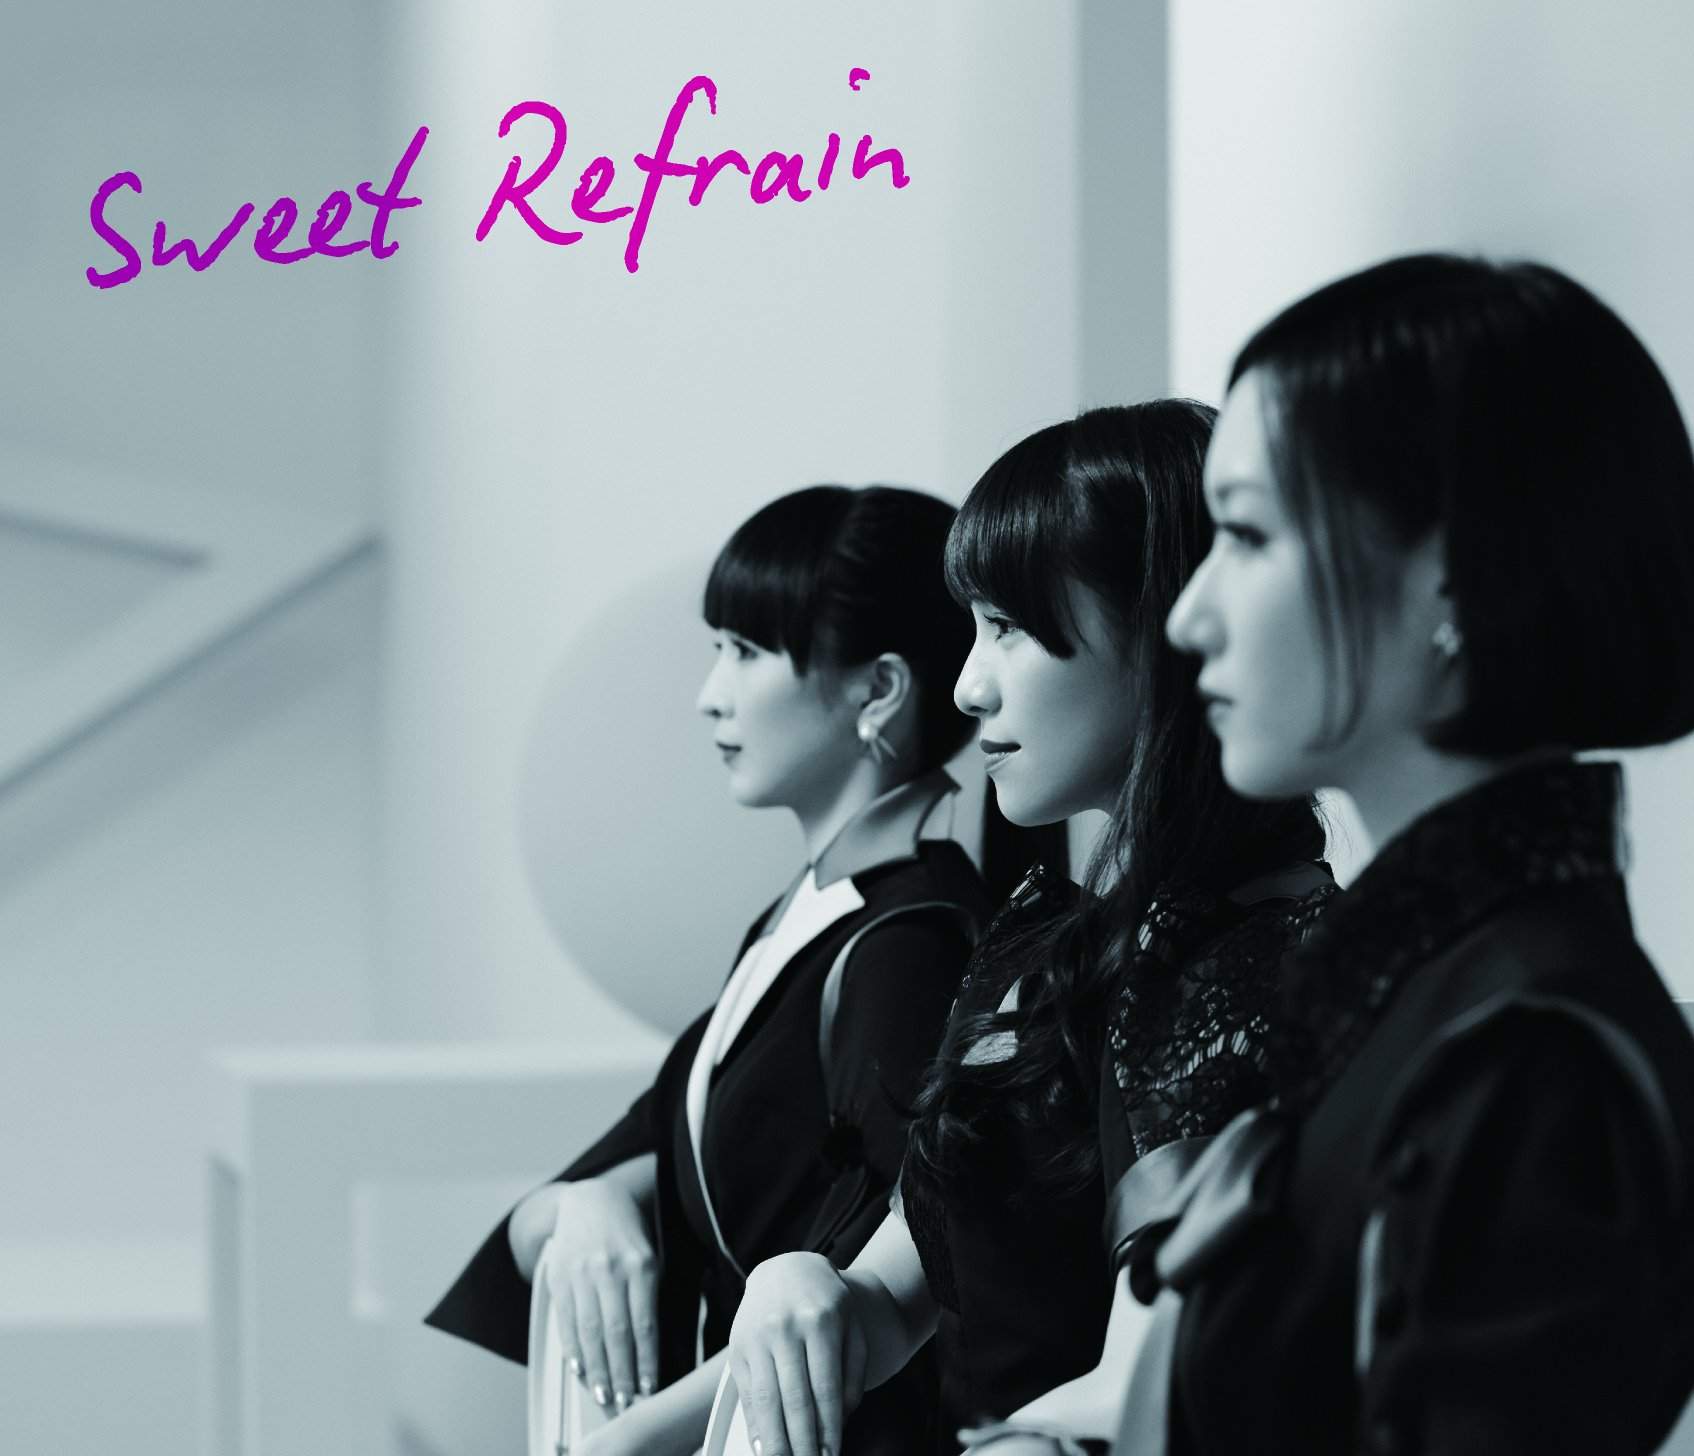 20160303.23 Perfume - Sweet Refrain cover 1.jpg